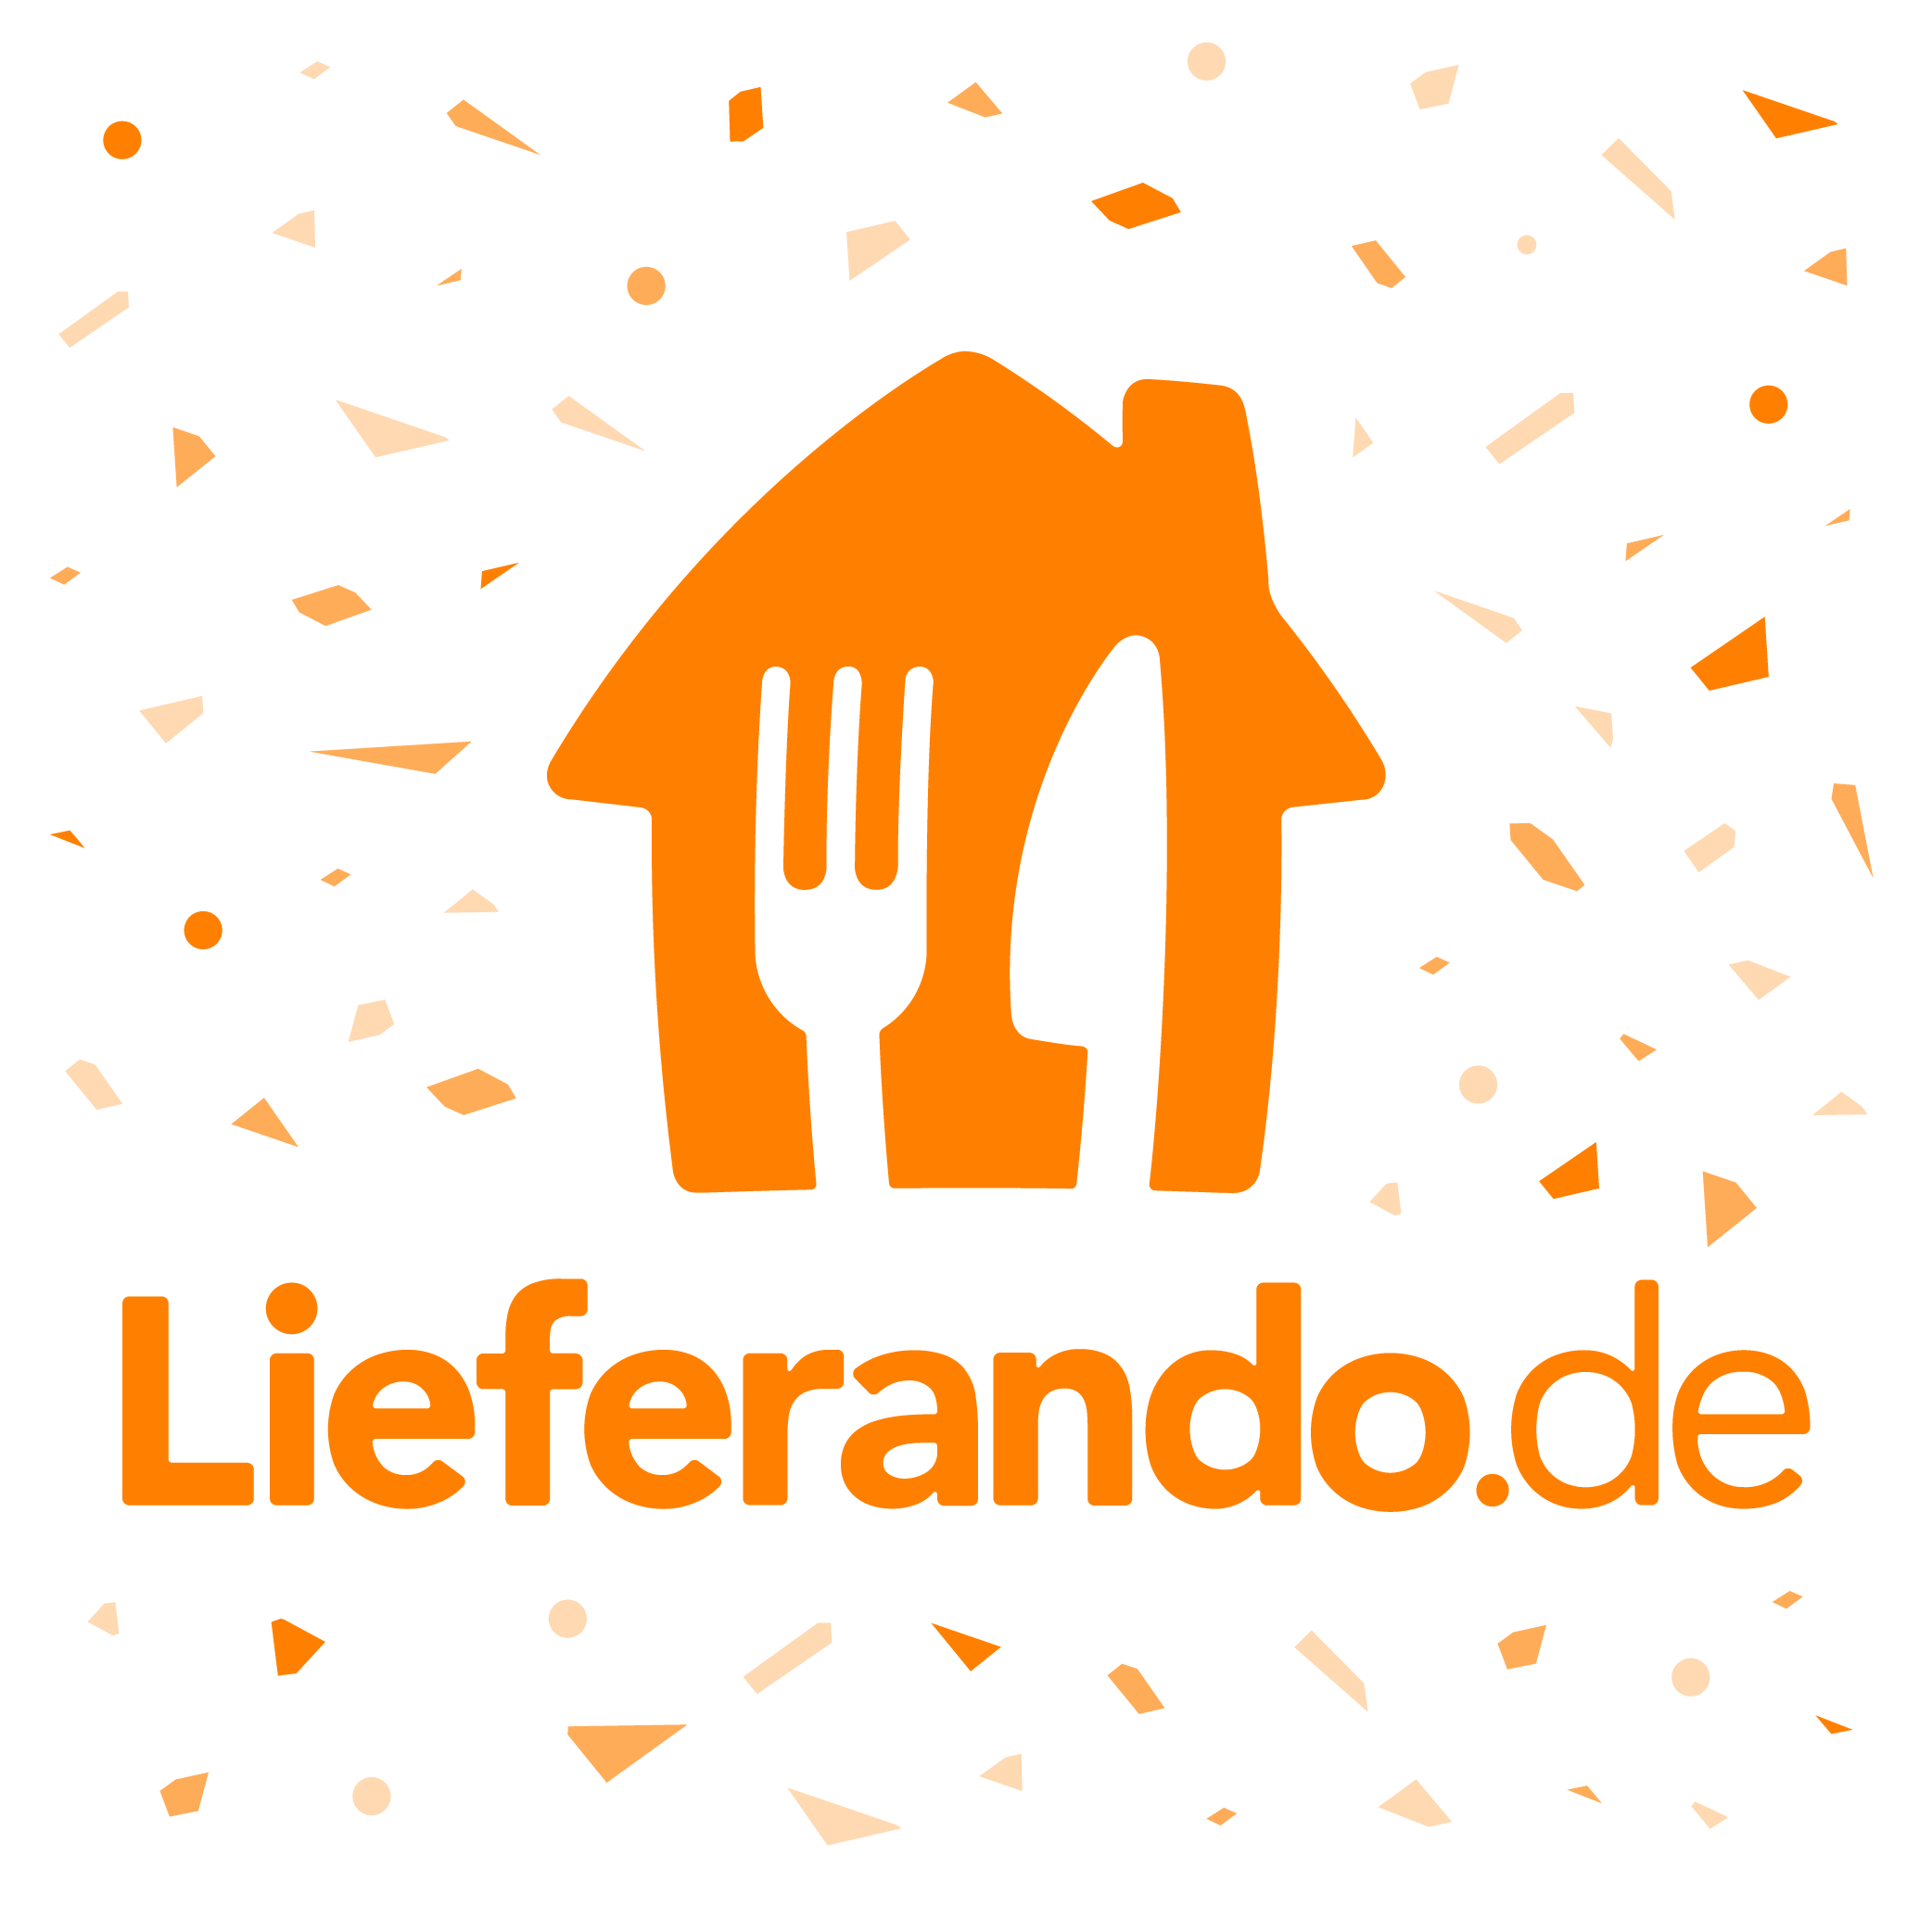 Lieferando.de   20€ App Gutschein von Lieferando.de   Lieferando.d